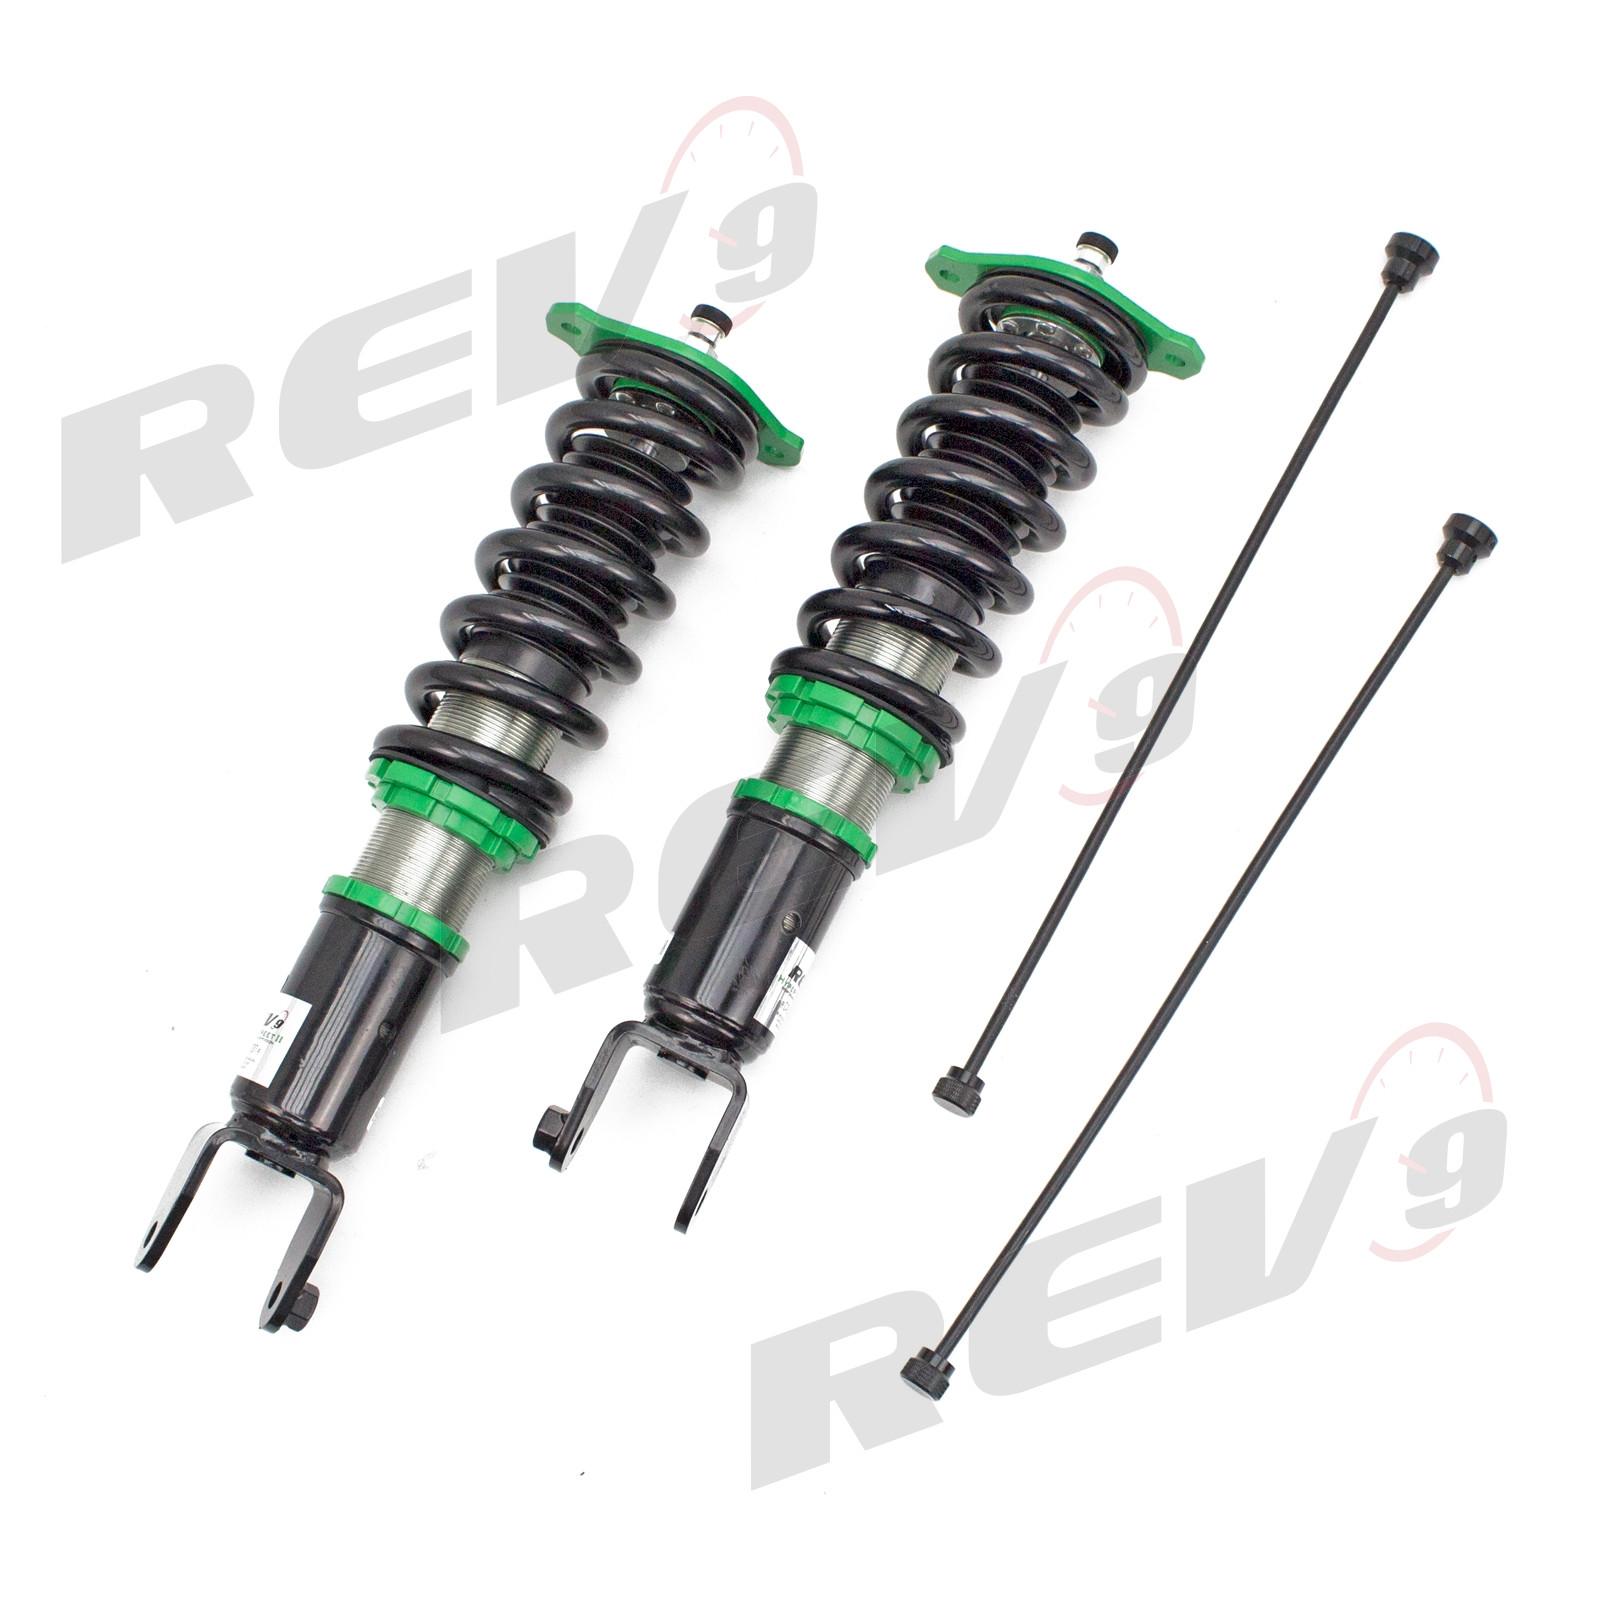 Rev9Power: Hyper-Street 2 Coilover Dampers Nissan 350Z Z33